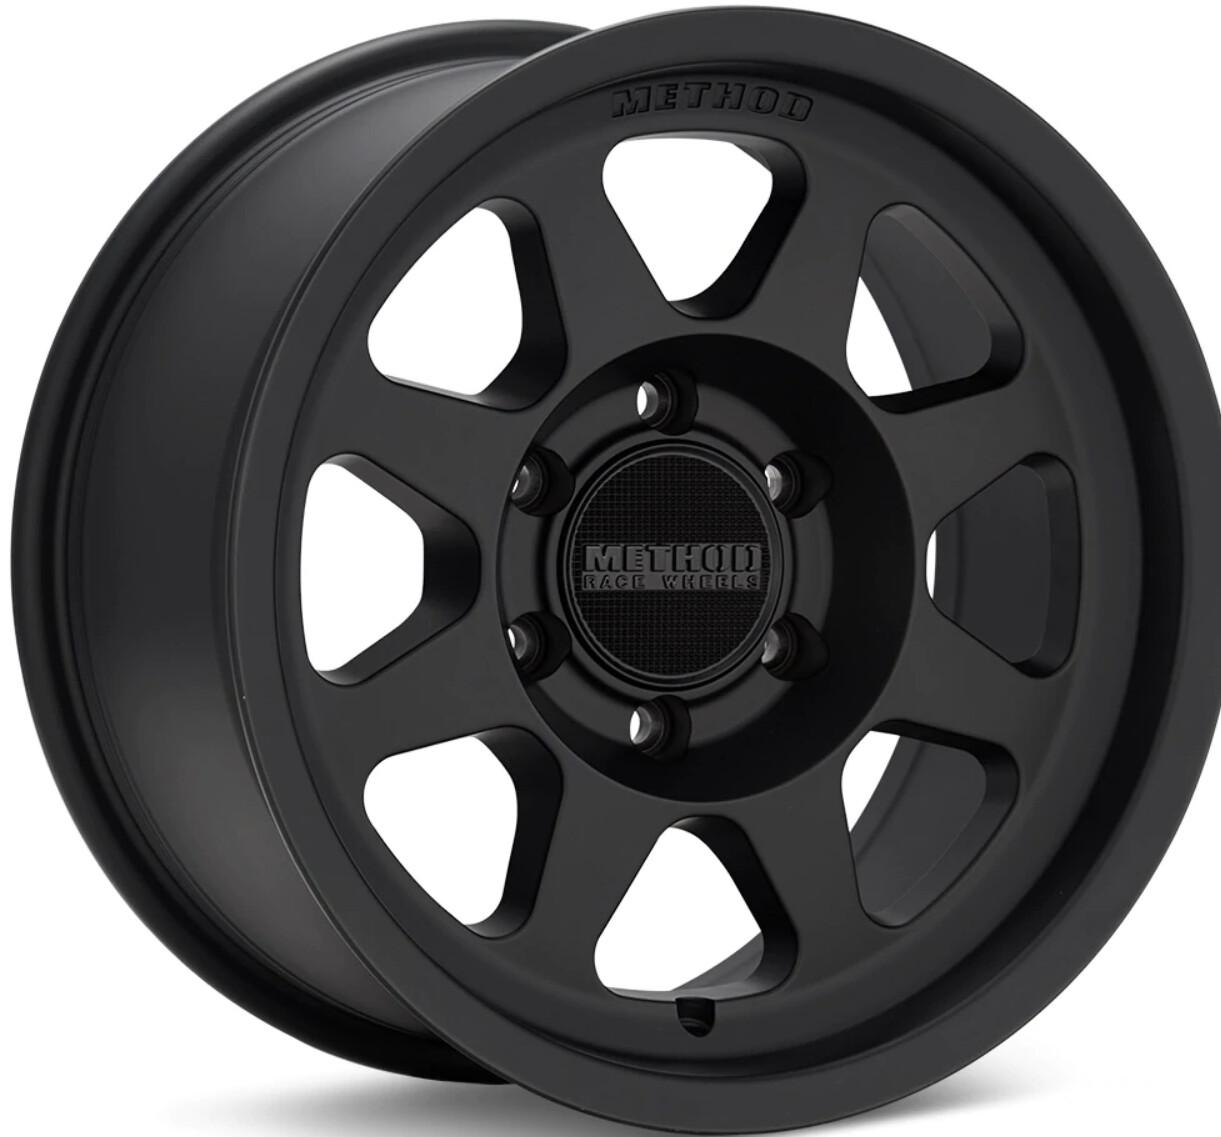 Method / BFG K02 Rim & Tire Packages